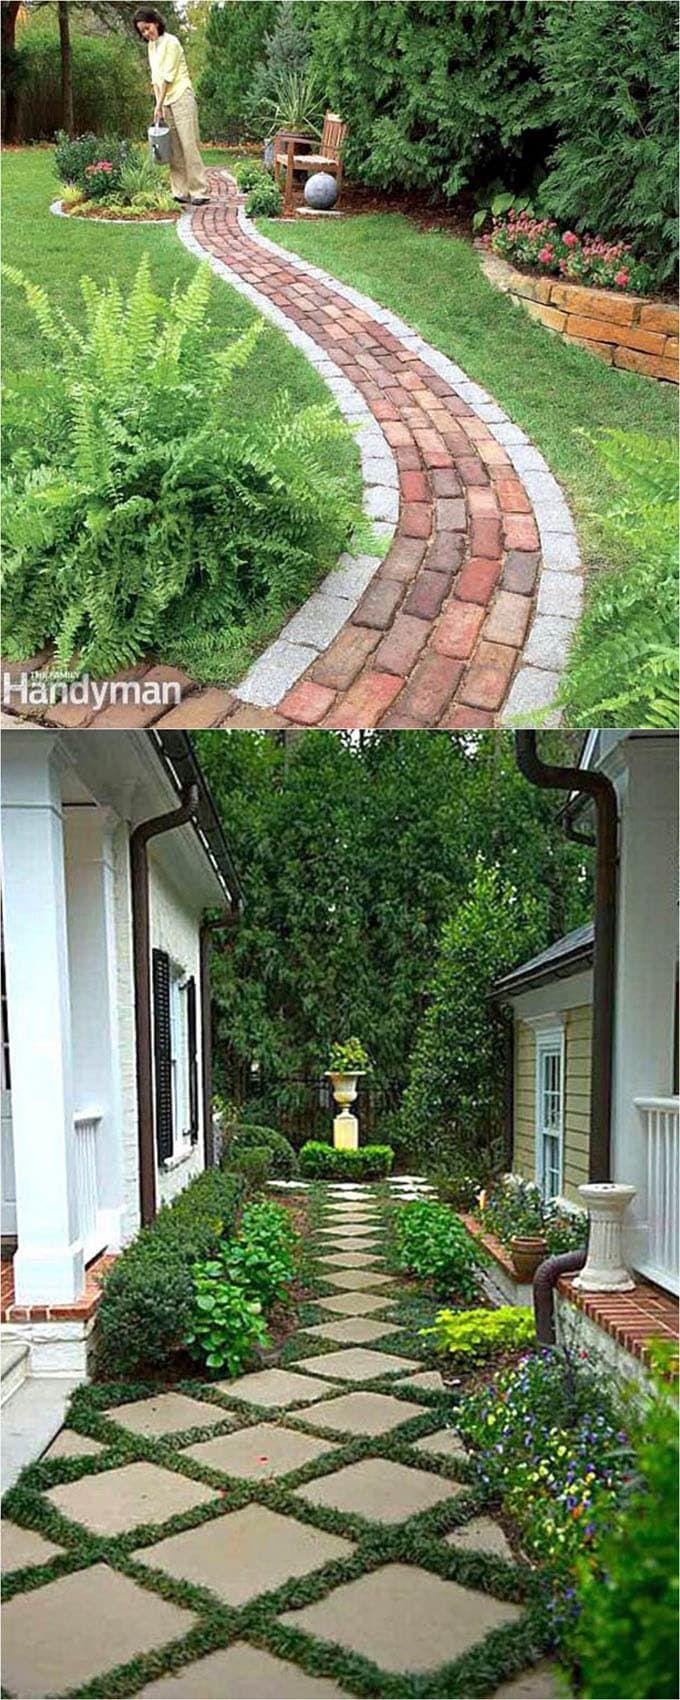 25 most beautiful diy garden path ideas garden paths walkways and paths. Black Bedroom Furniture Sets. Home Design Ideas